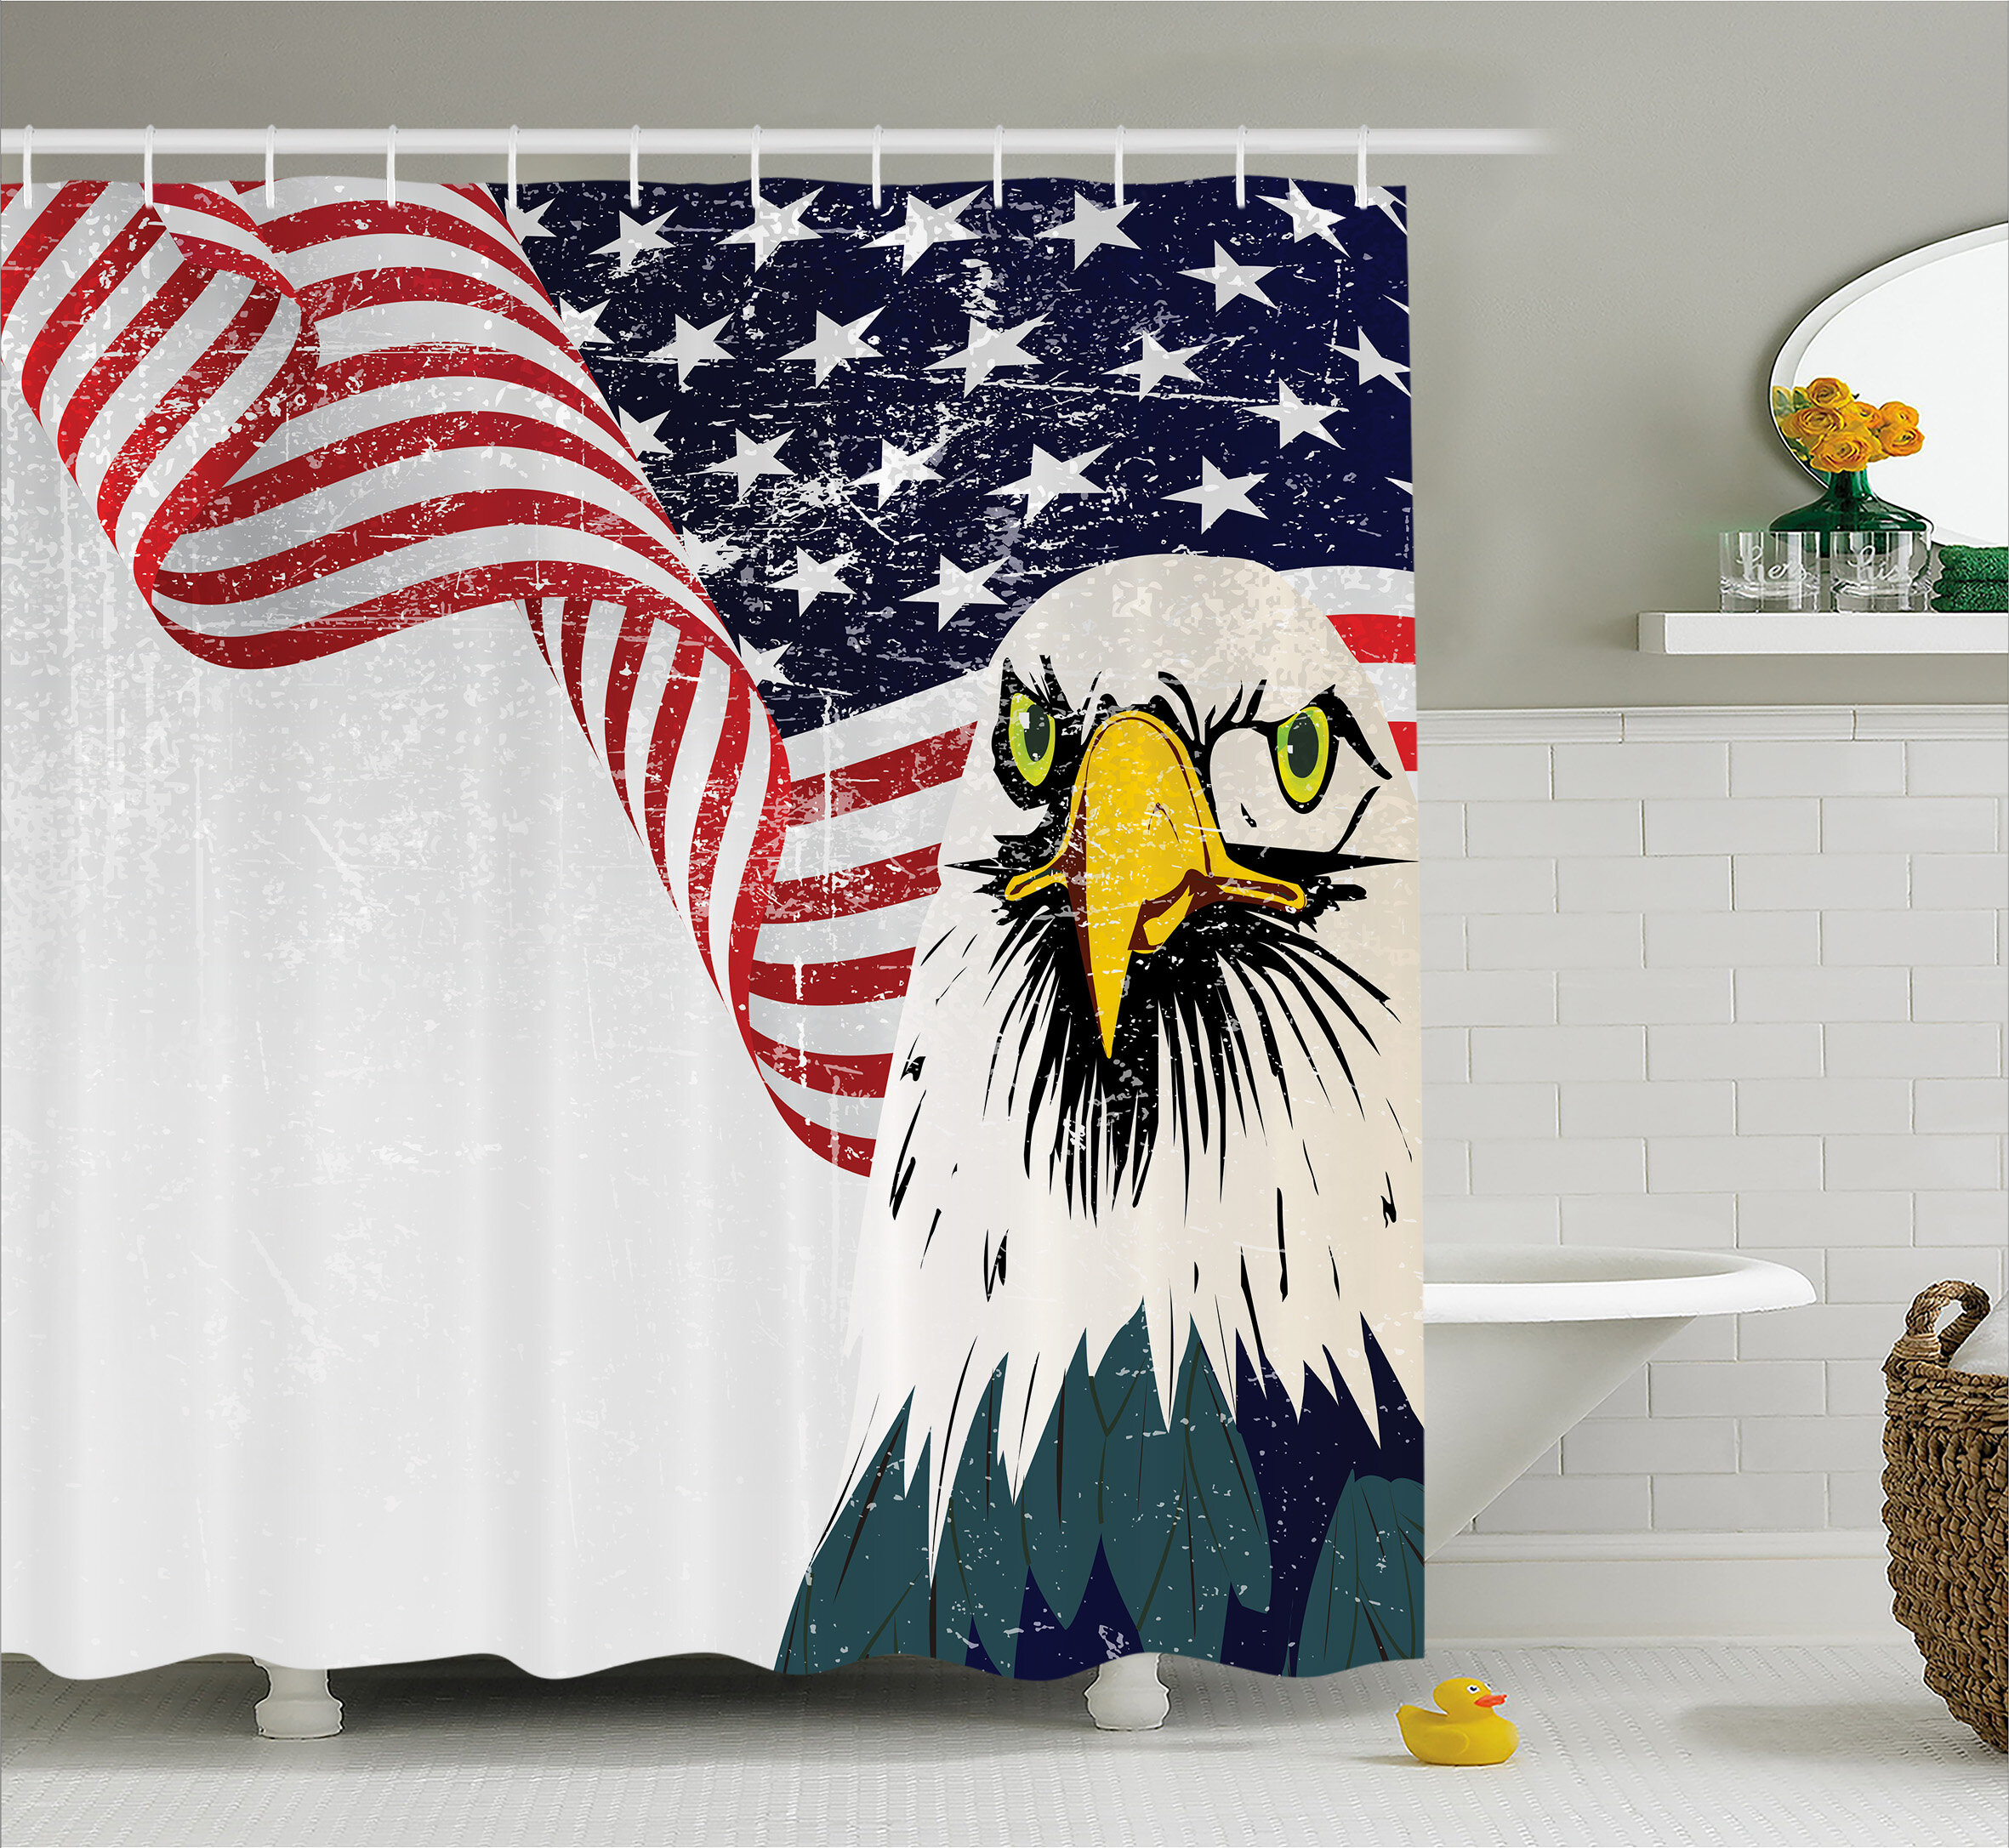 Eagle And Flag Decor Shower Curtain